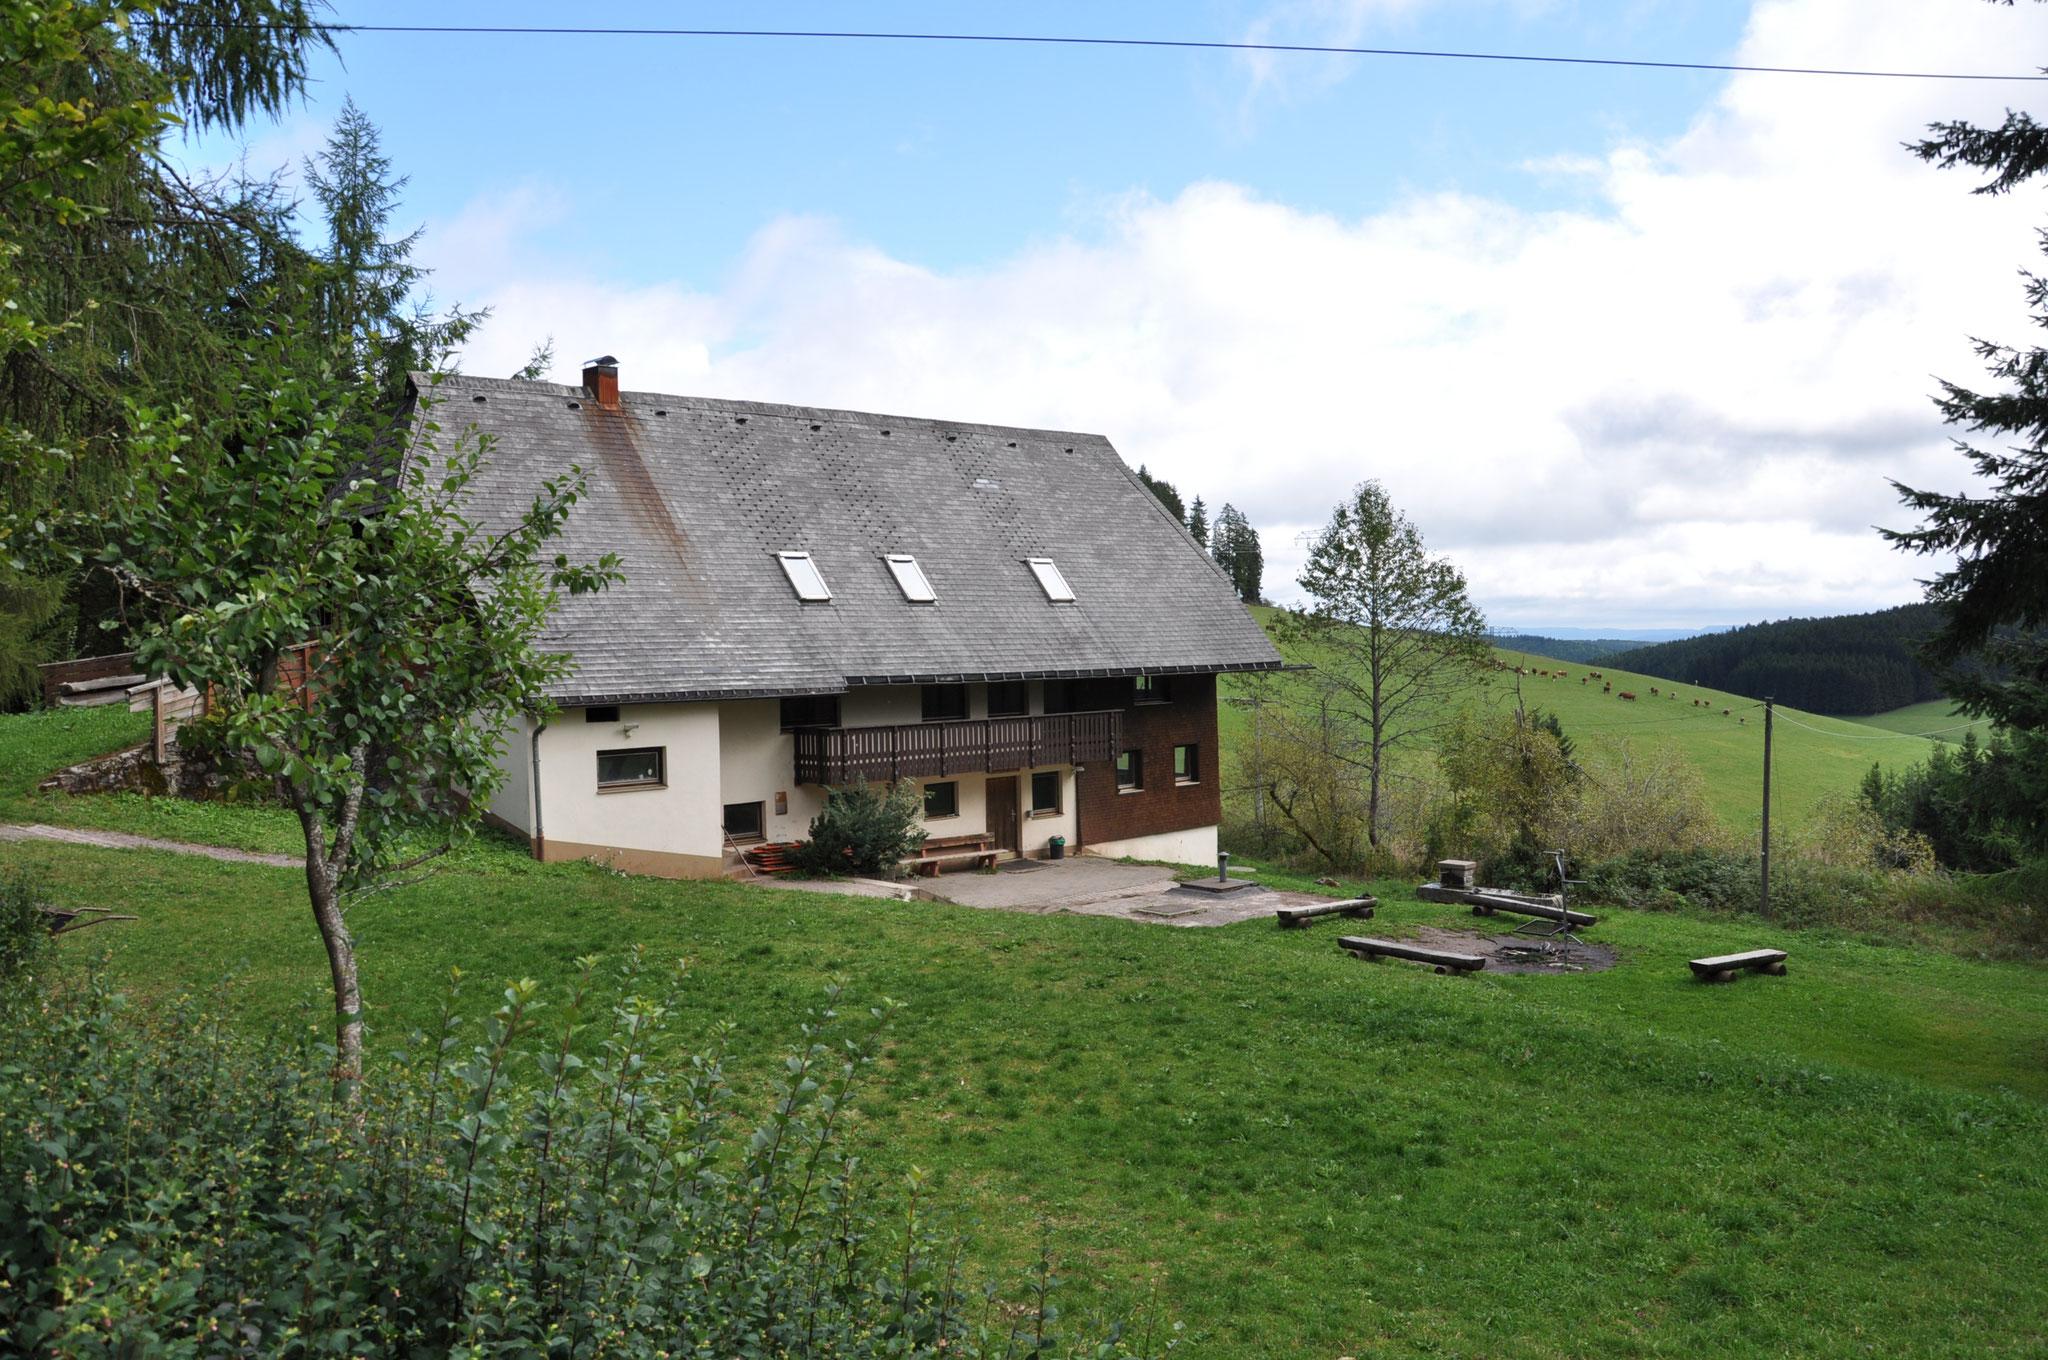 Kasperhaus mit Grillplatz